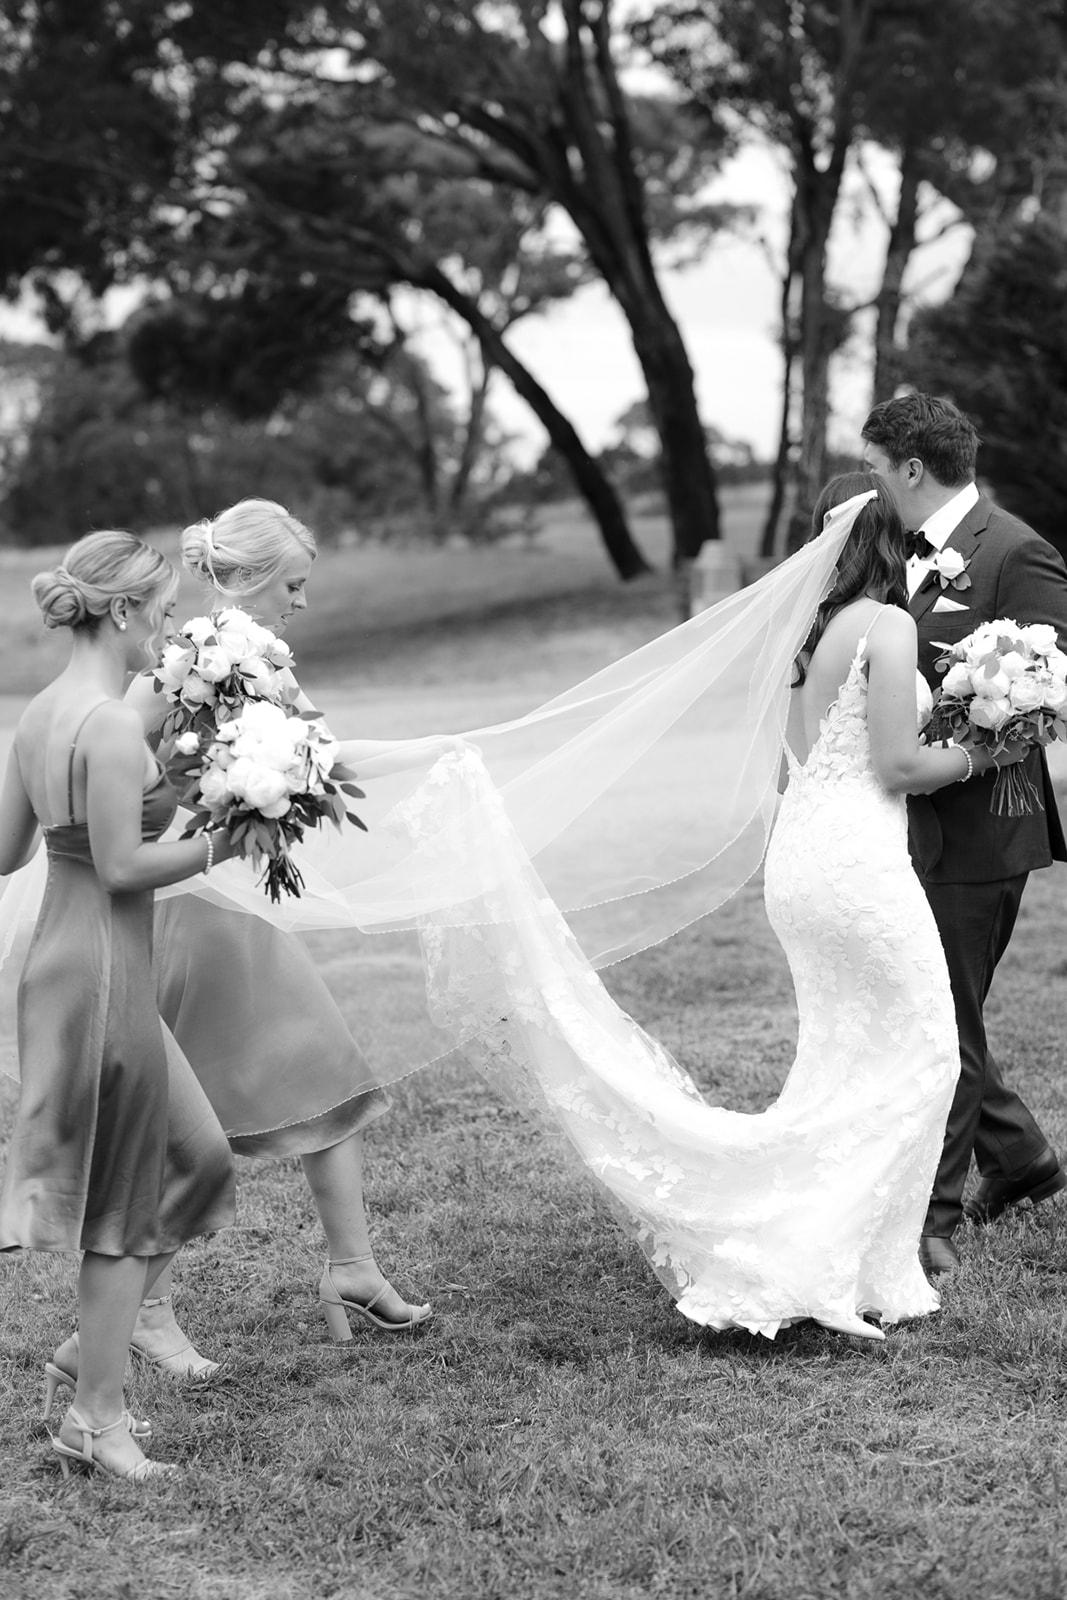 zelda green photography canberra real weddings florals venue cake wedding dress groom suit